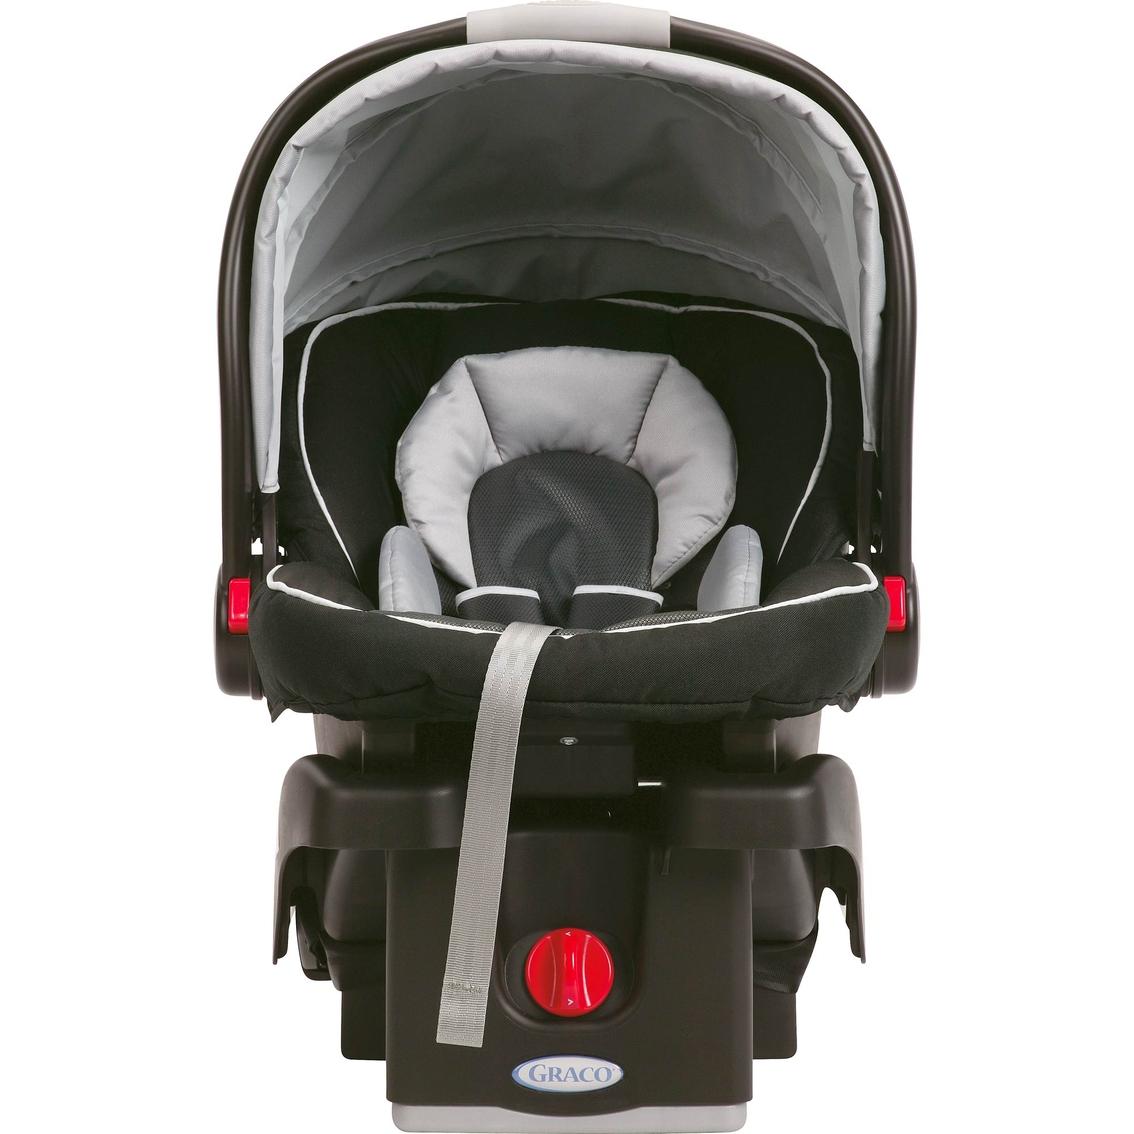 Graco Snugride Click Connect  Infant Car Seat Manual